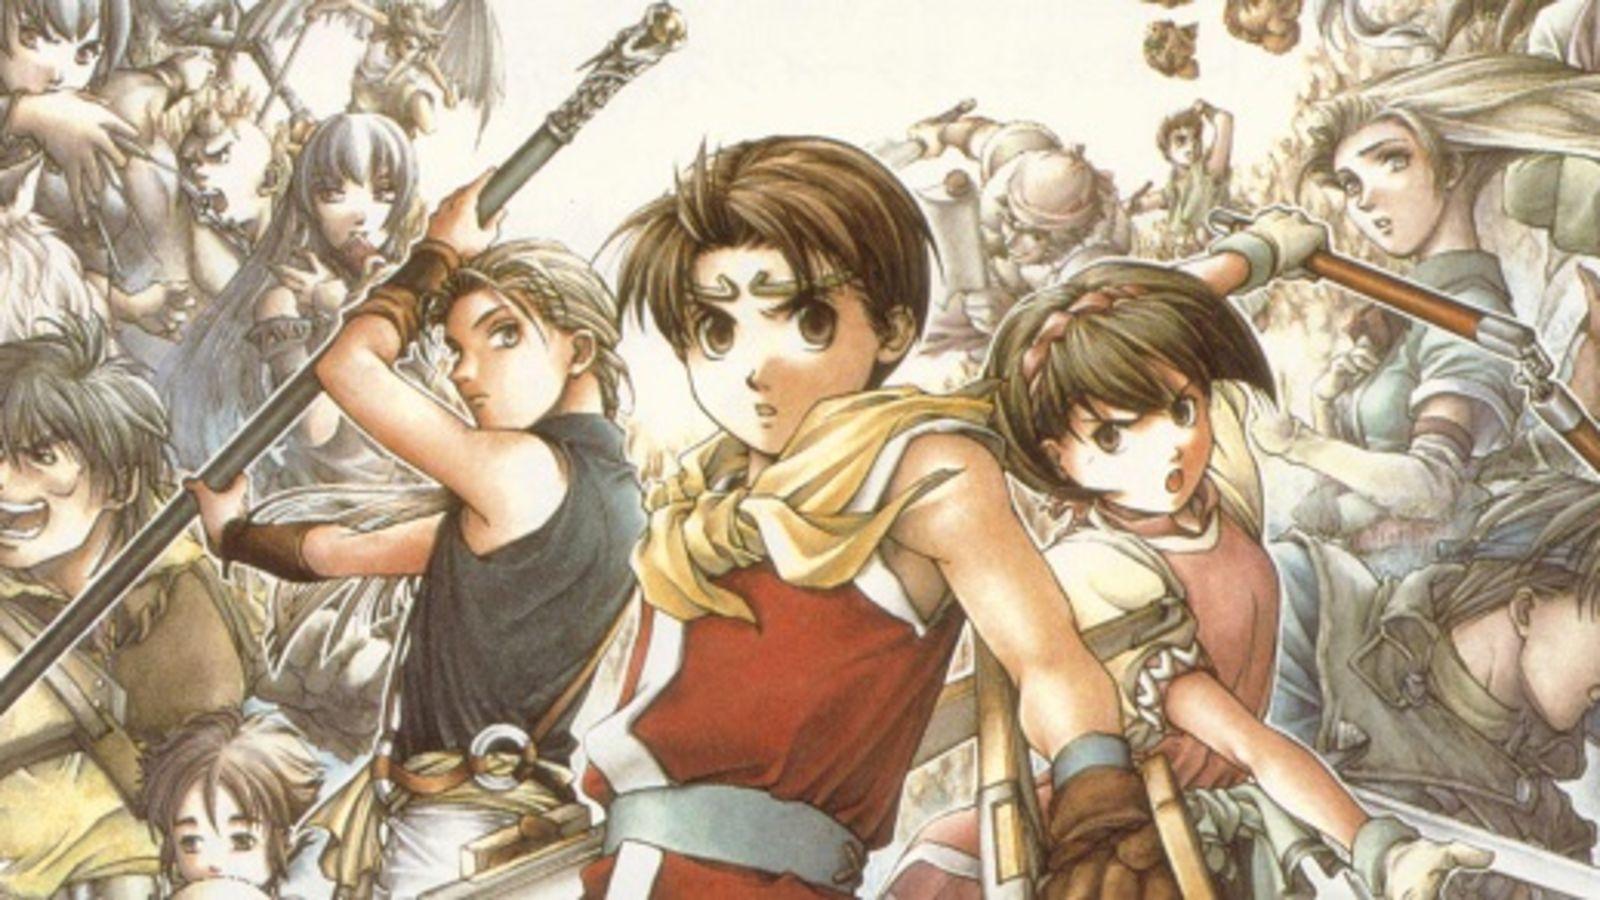 Suikoden II | 7 Games That Deserve a Remake Besides Final Fantasy VII | Gammicks